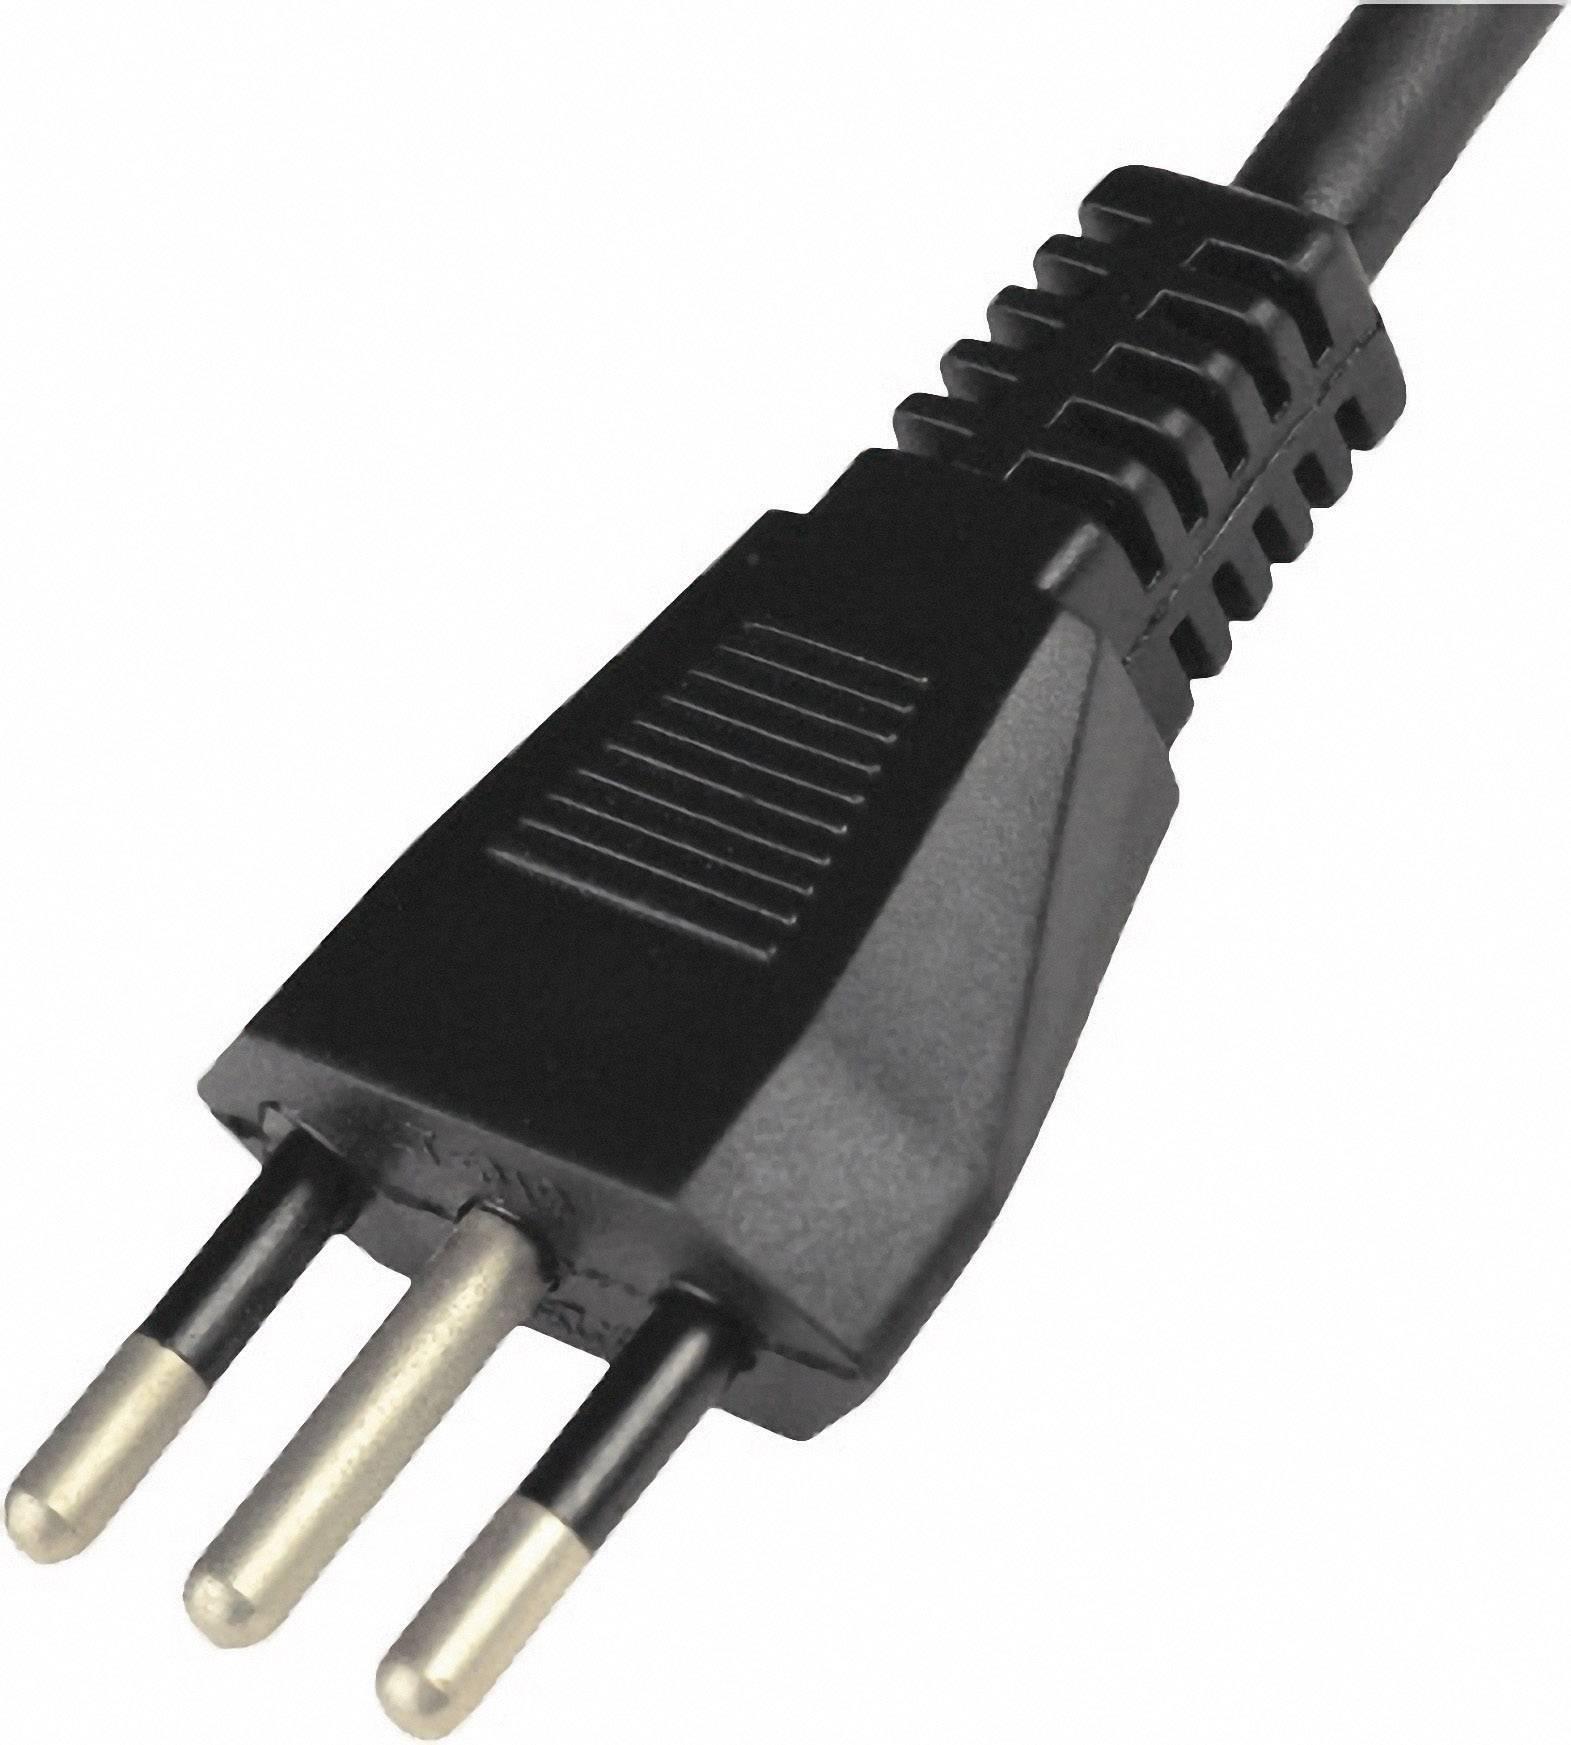 Síťový kabel Hawa, italská zástrčka/otevřený konec, 0,75 mm², 2 m, 1008262